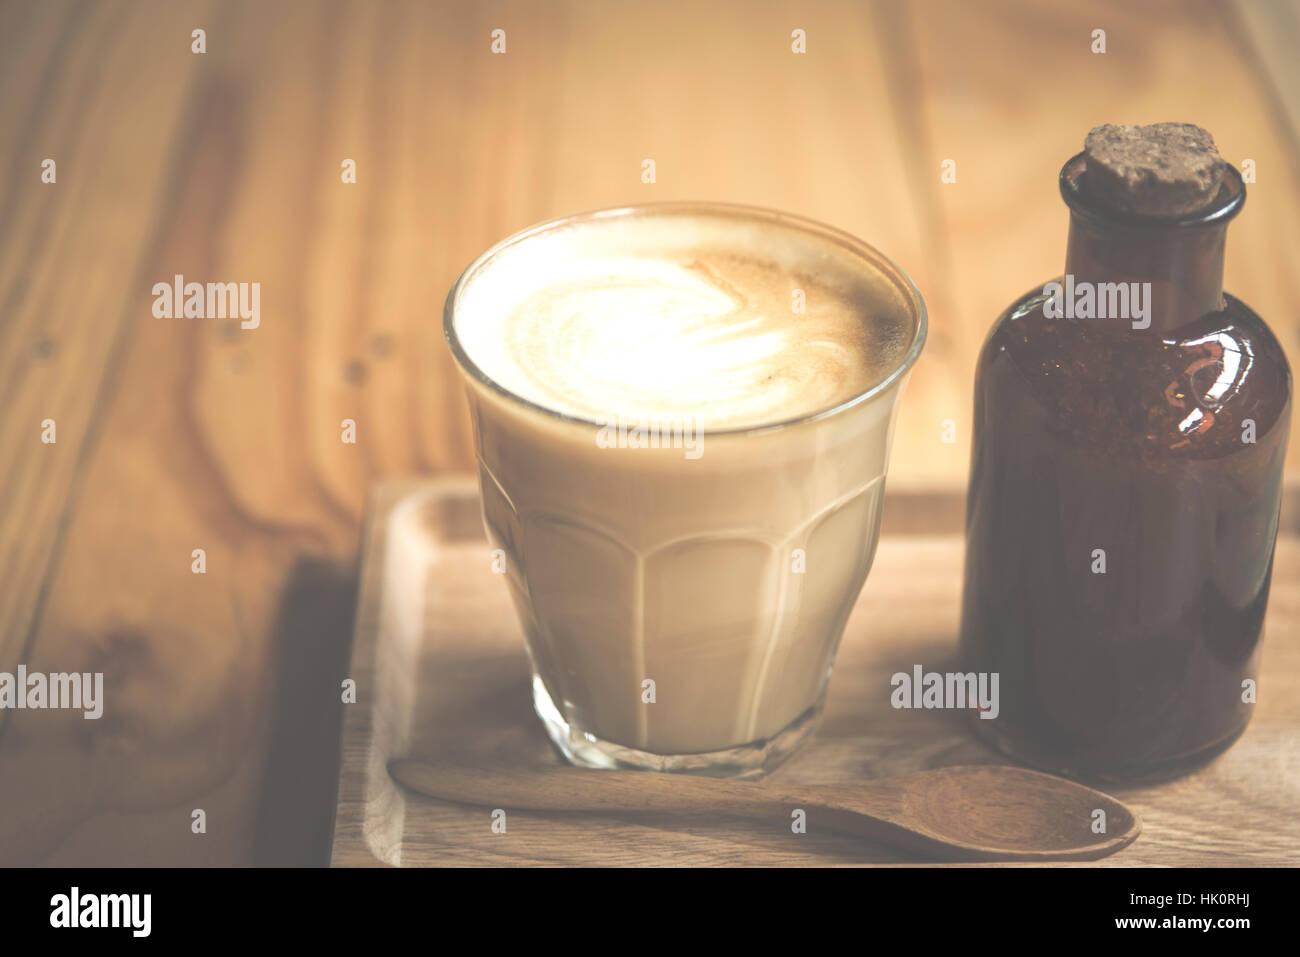 vintage art filter image of coffee latte art in cafe - Stock Image